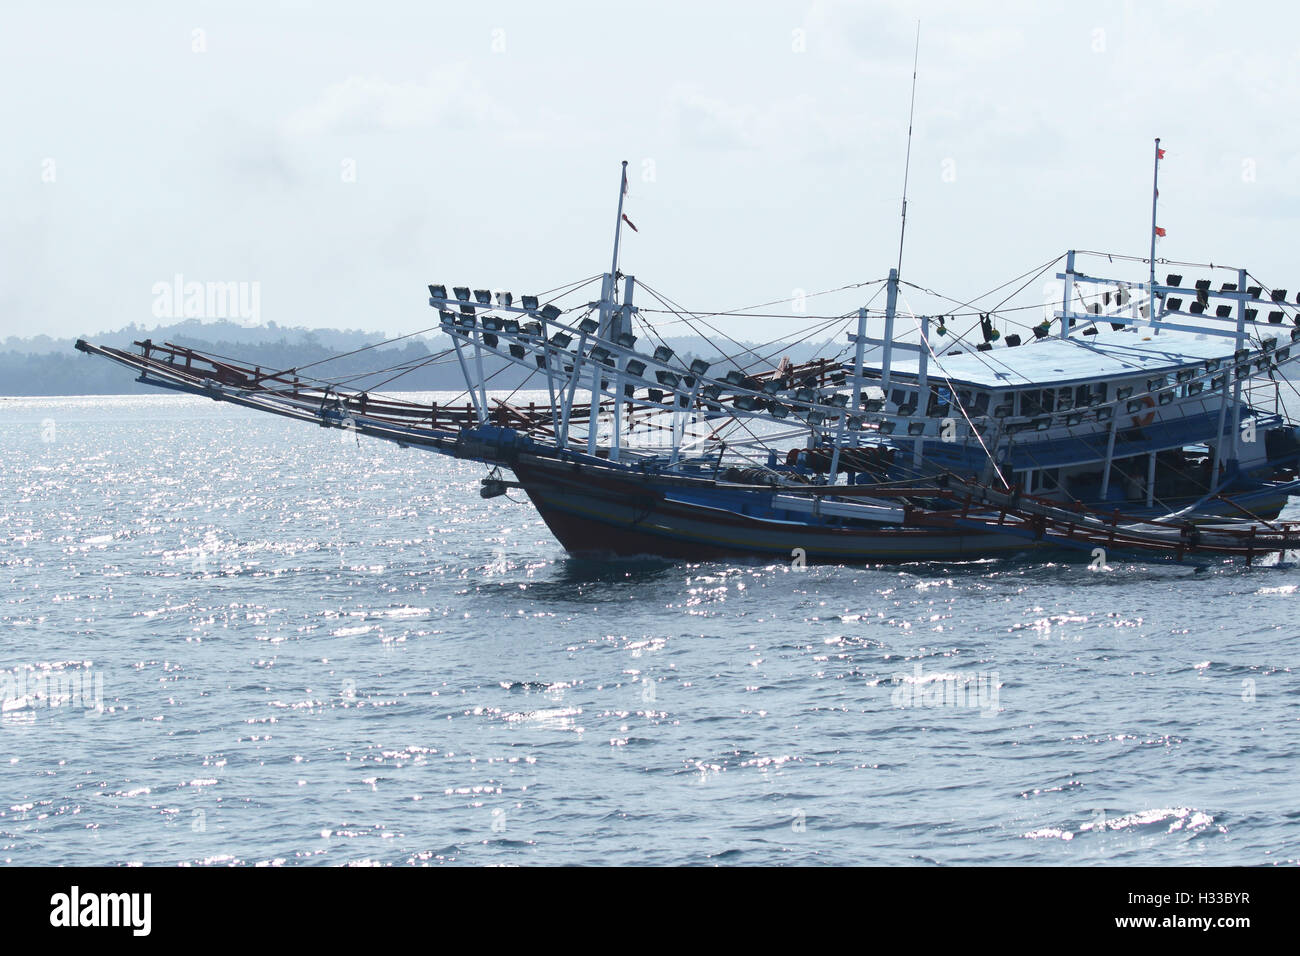 Large Fishing Boat at the Mentawai Islands - Stock Image